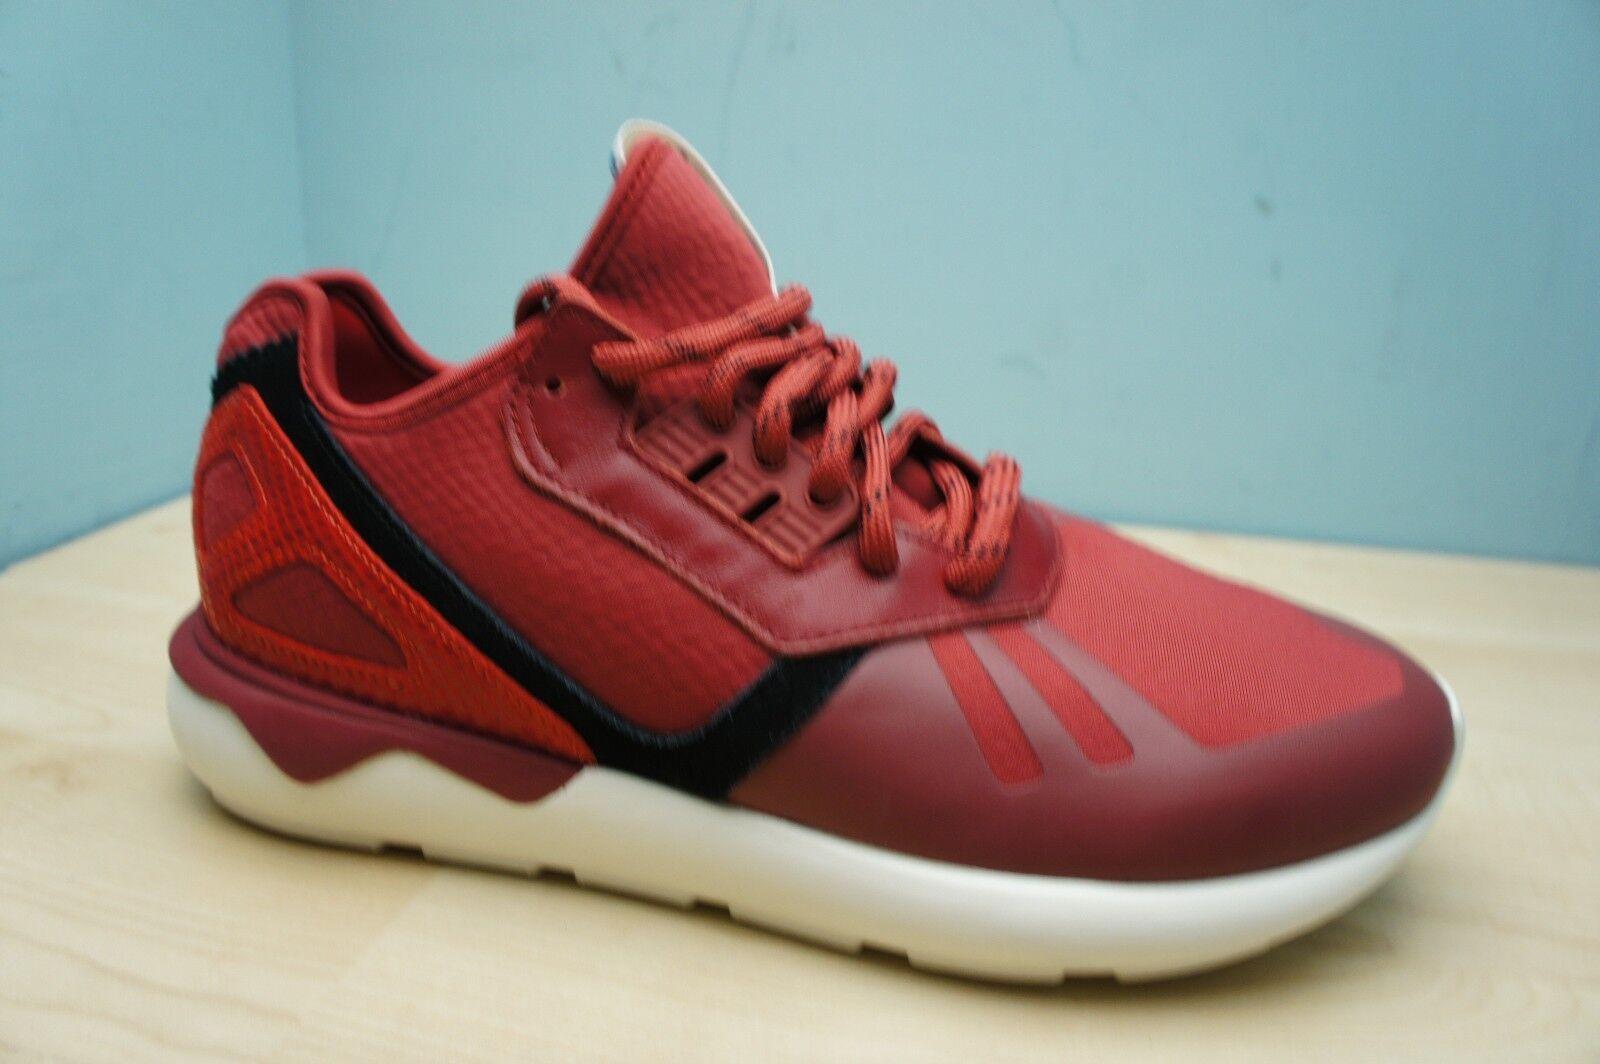 Adidas Originals Mens Größe 7 UK UK UK Tubular Power rot & Weiß Running Gym Trainers 963008